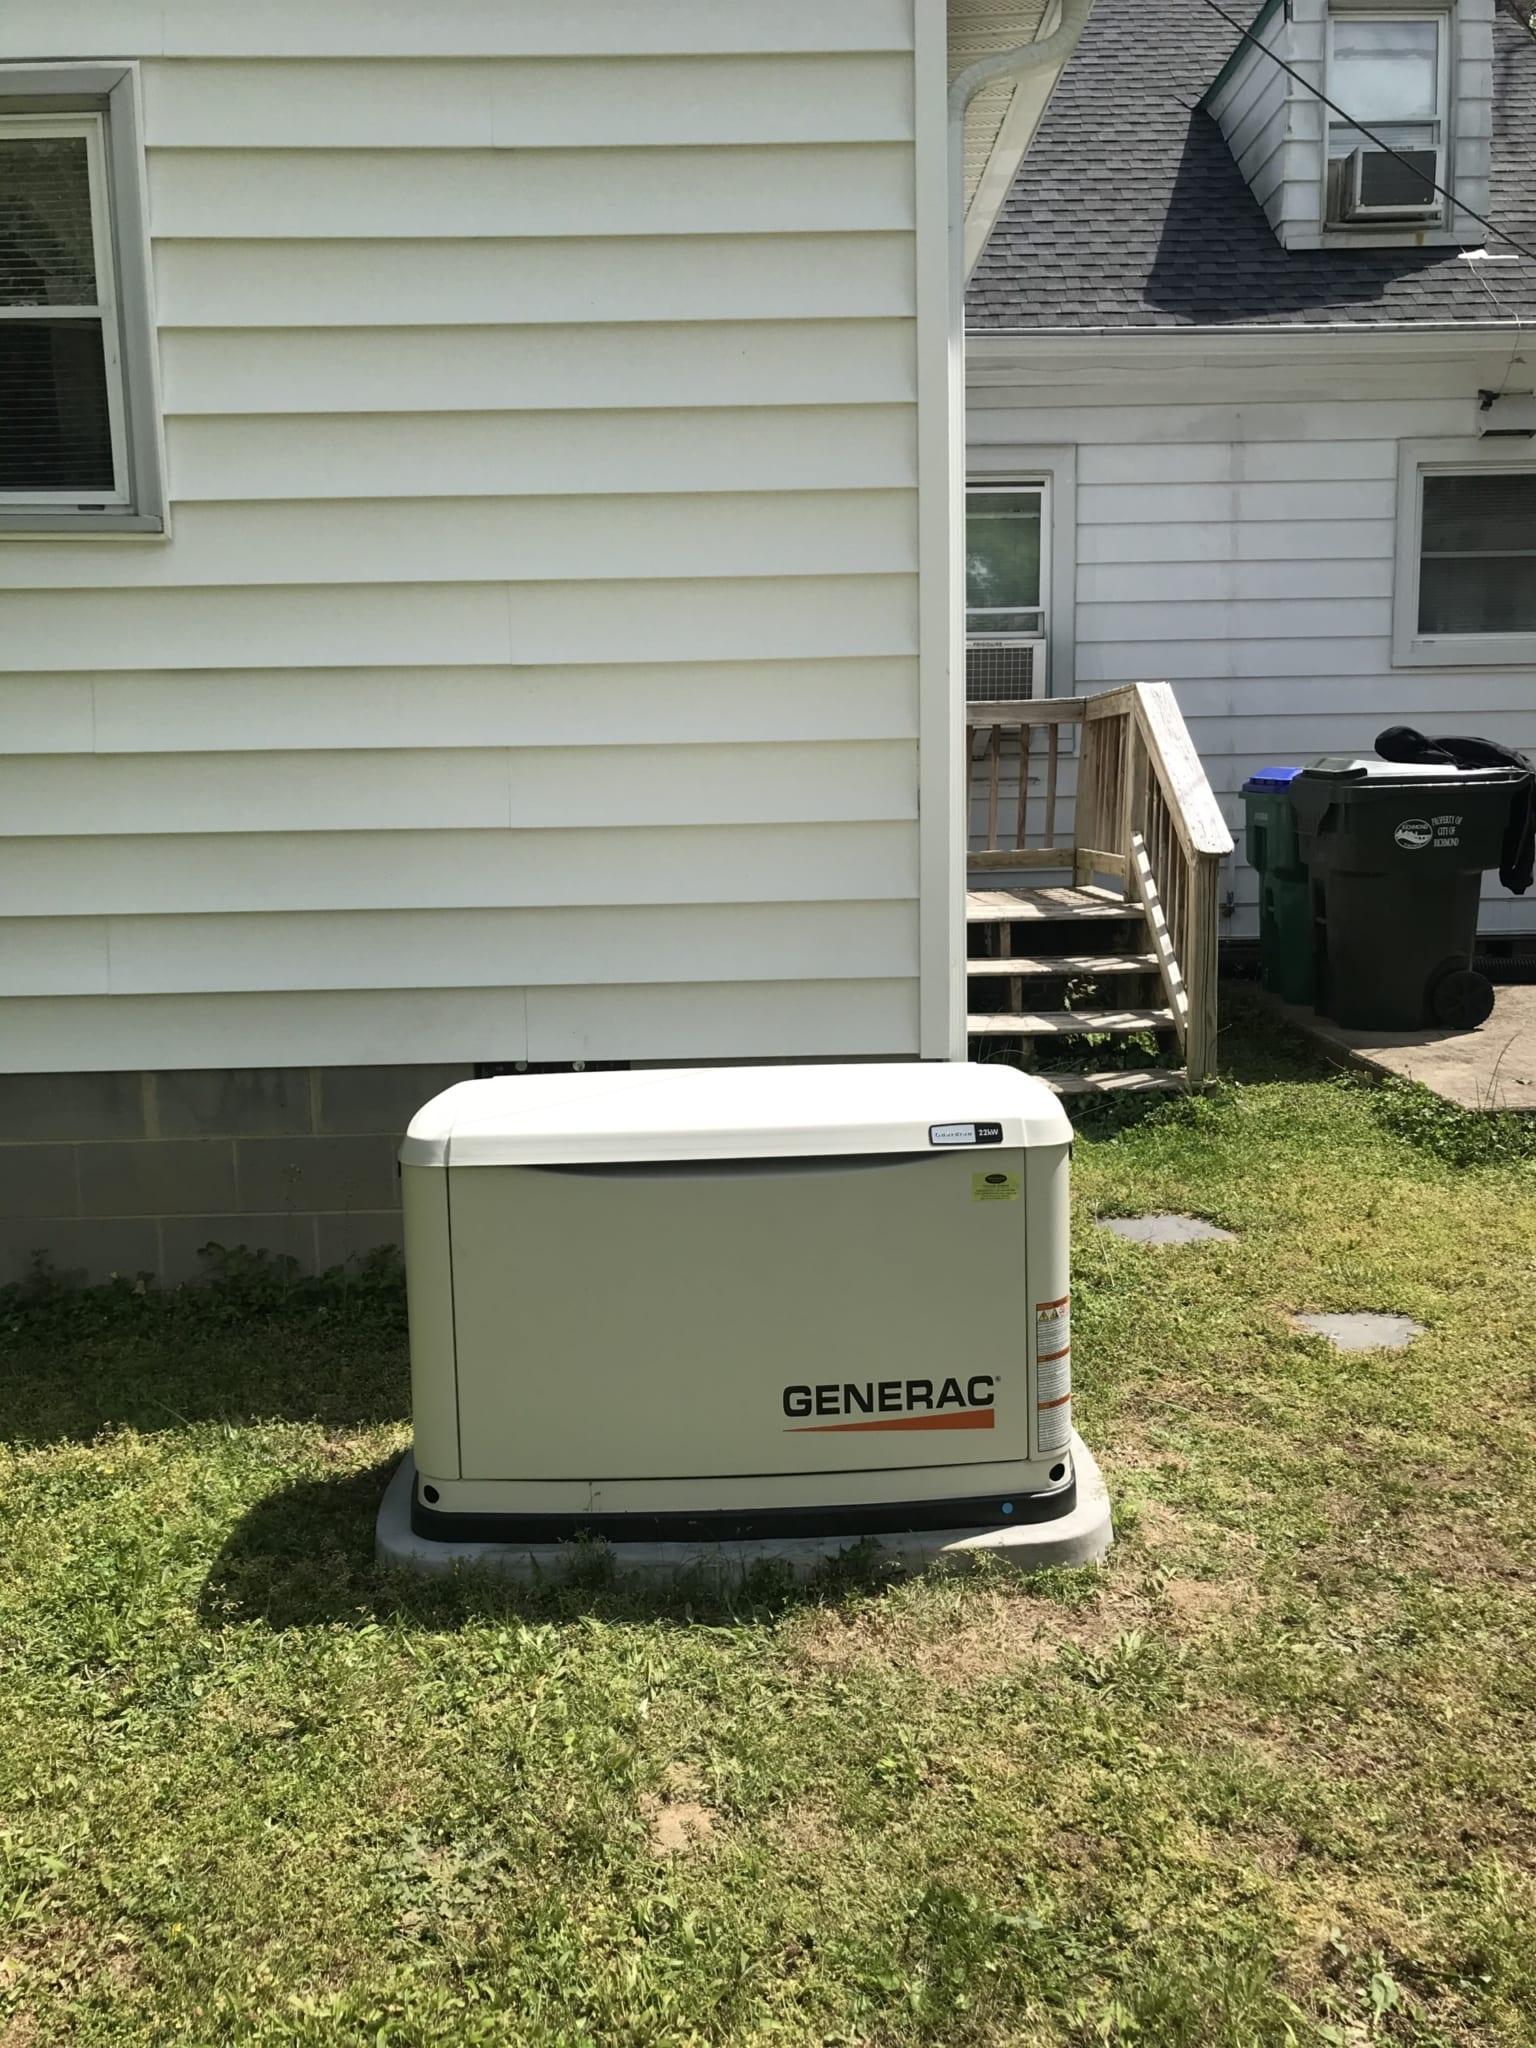 4.17.20 Richmond Generac Automatic Standby Generator